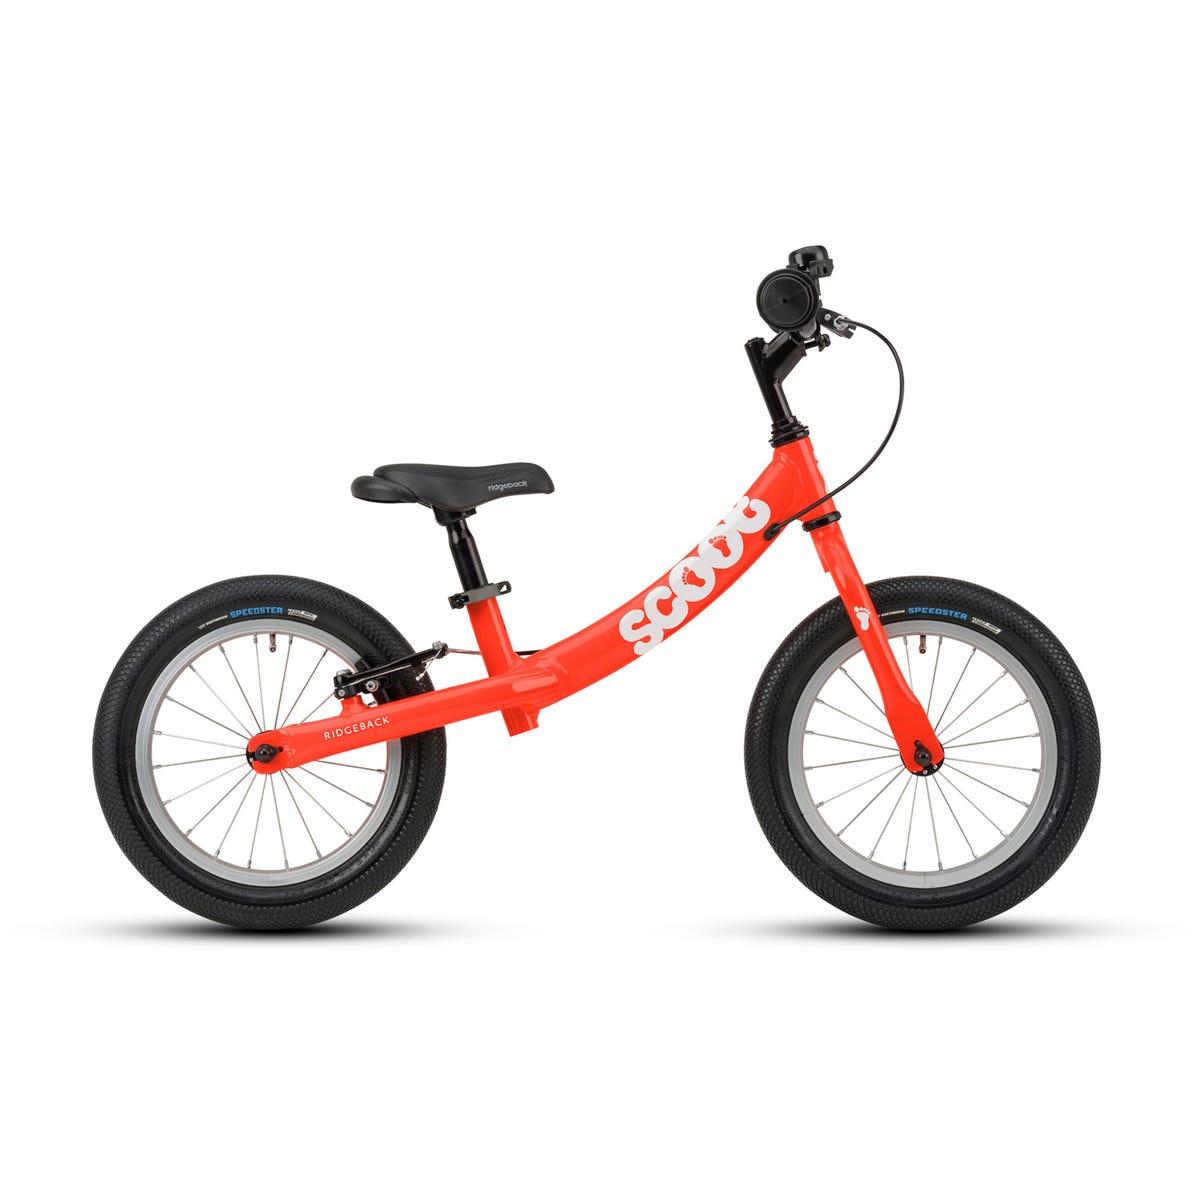 Ridgeback Scoot XL